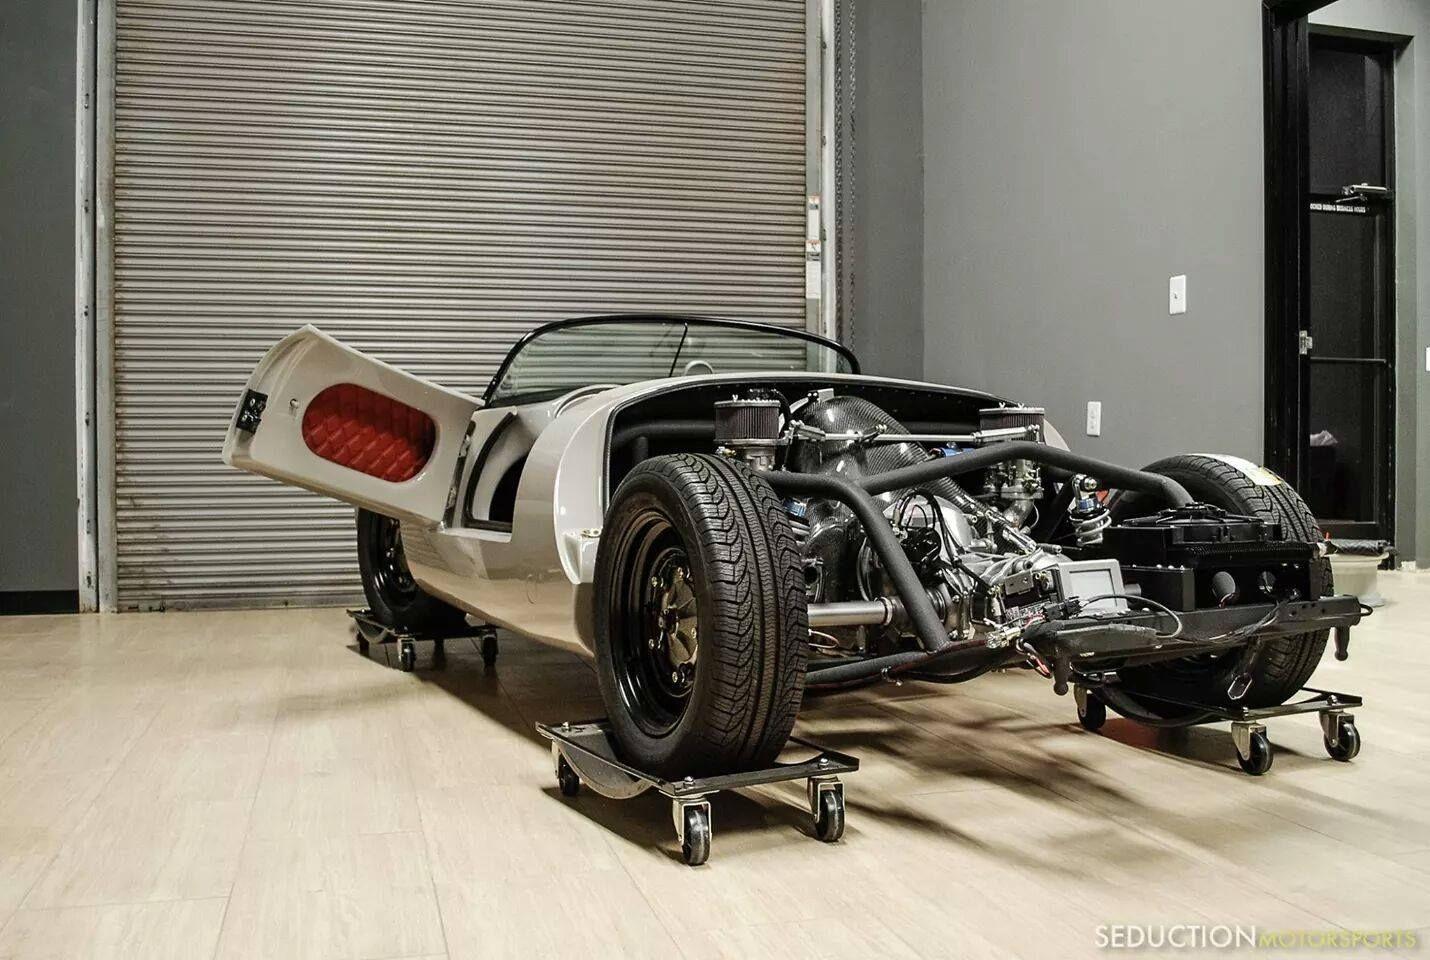 Check Engine Size By Vin Number >> 1955 Seduction Motorsports 550 Spyder - Bespoke Outlaw